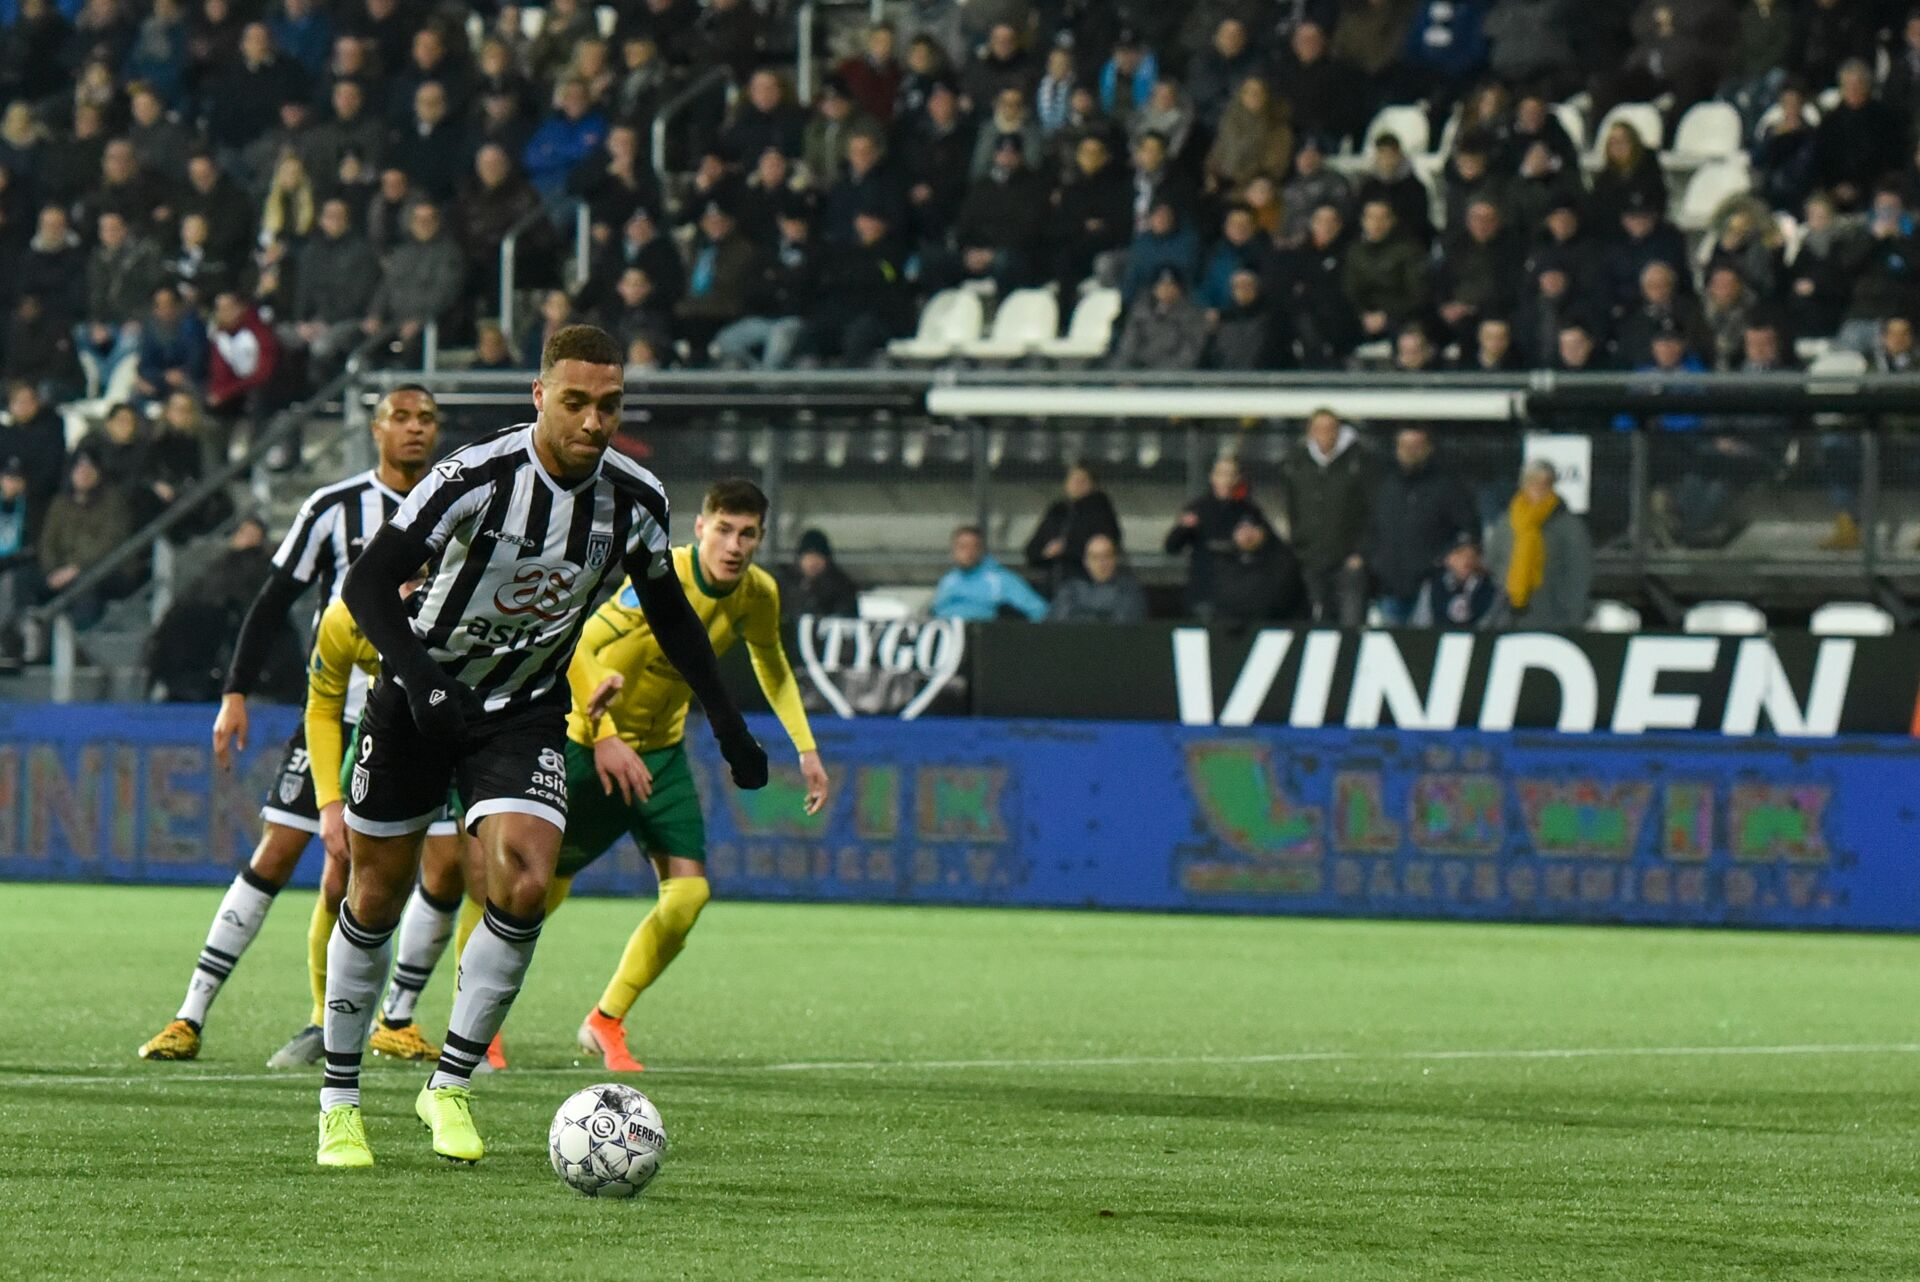 Eredivisie: Dessers Bags Brace As Heracles Beat Fortuna Sittard; End Winless Run